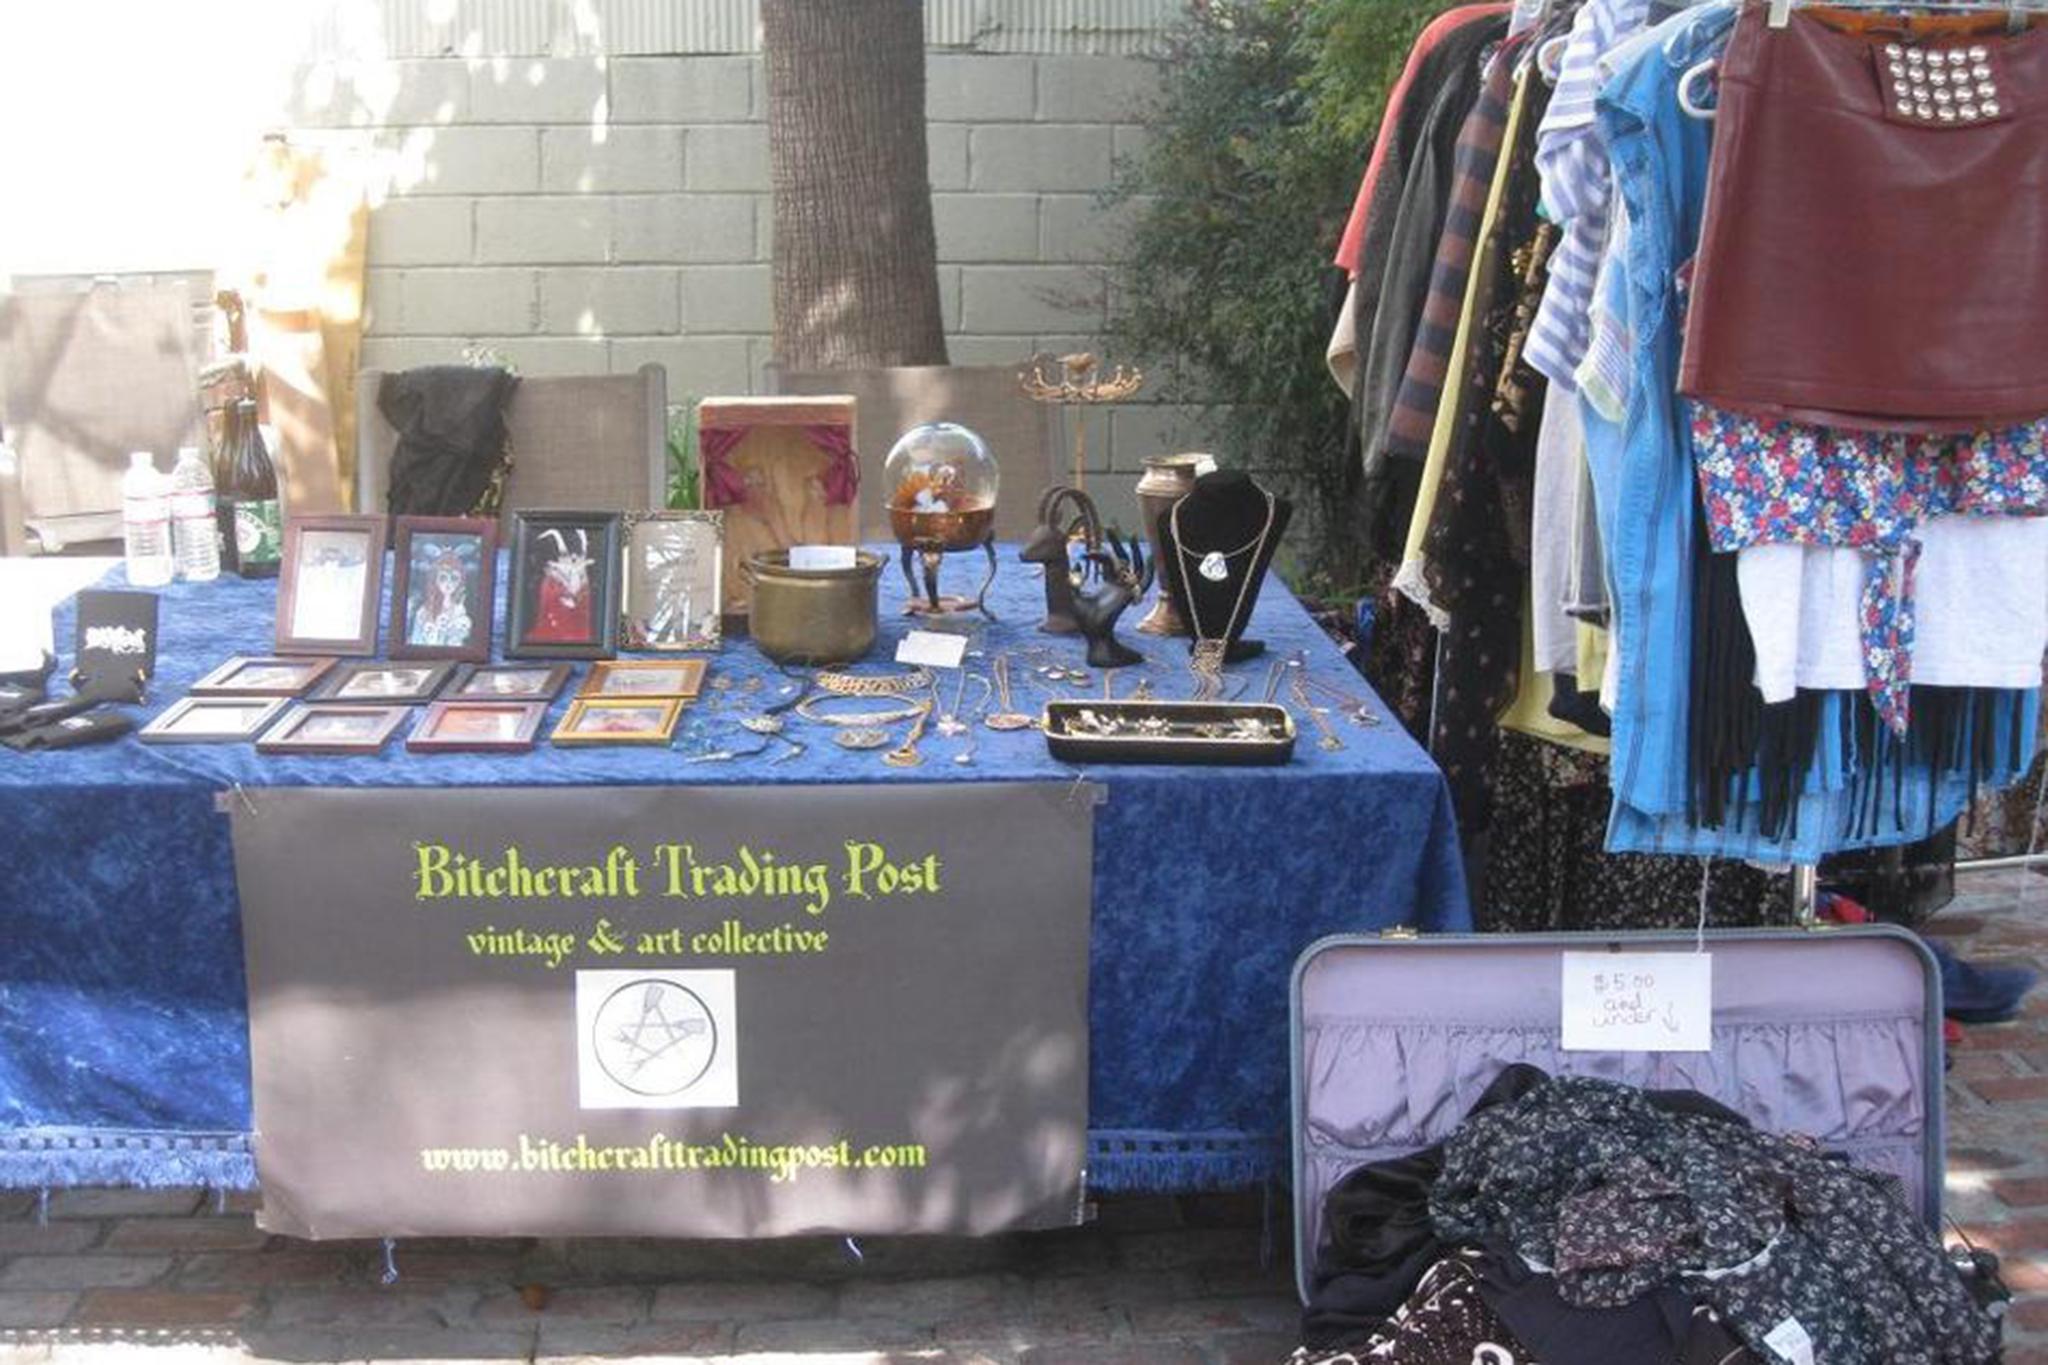 Bitchcraft Trading Post